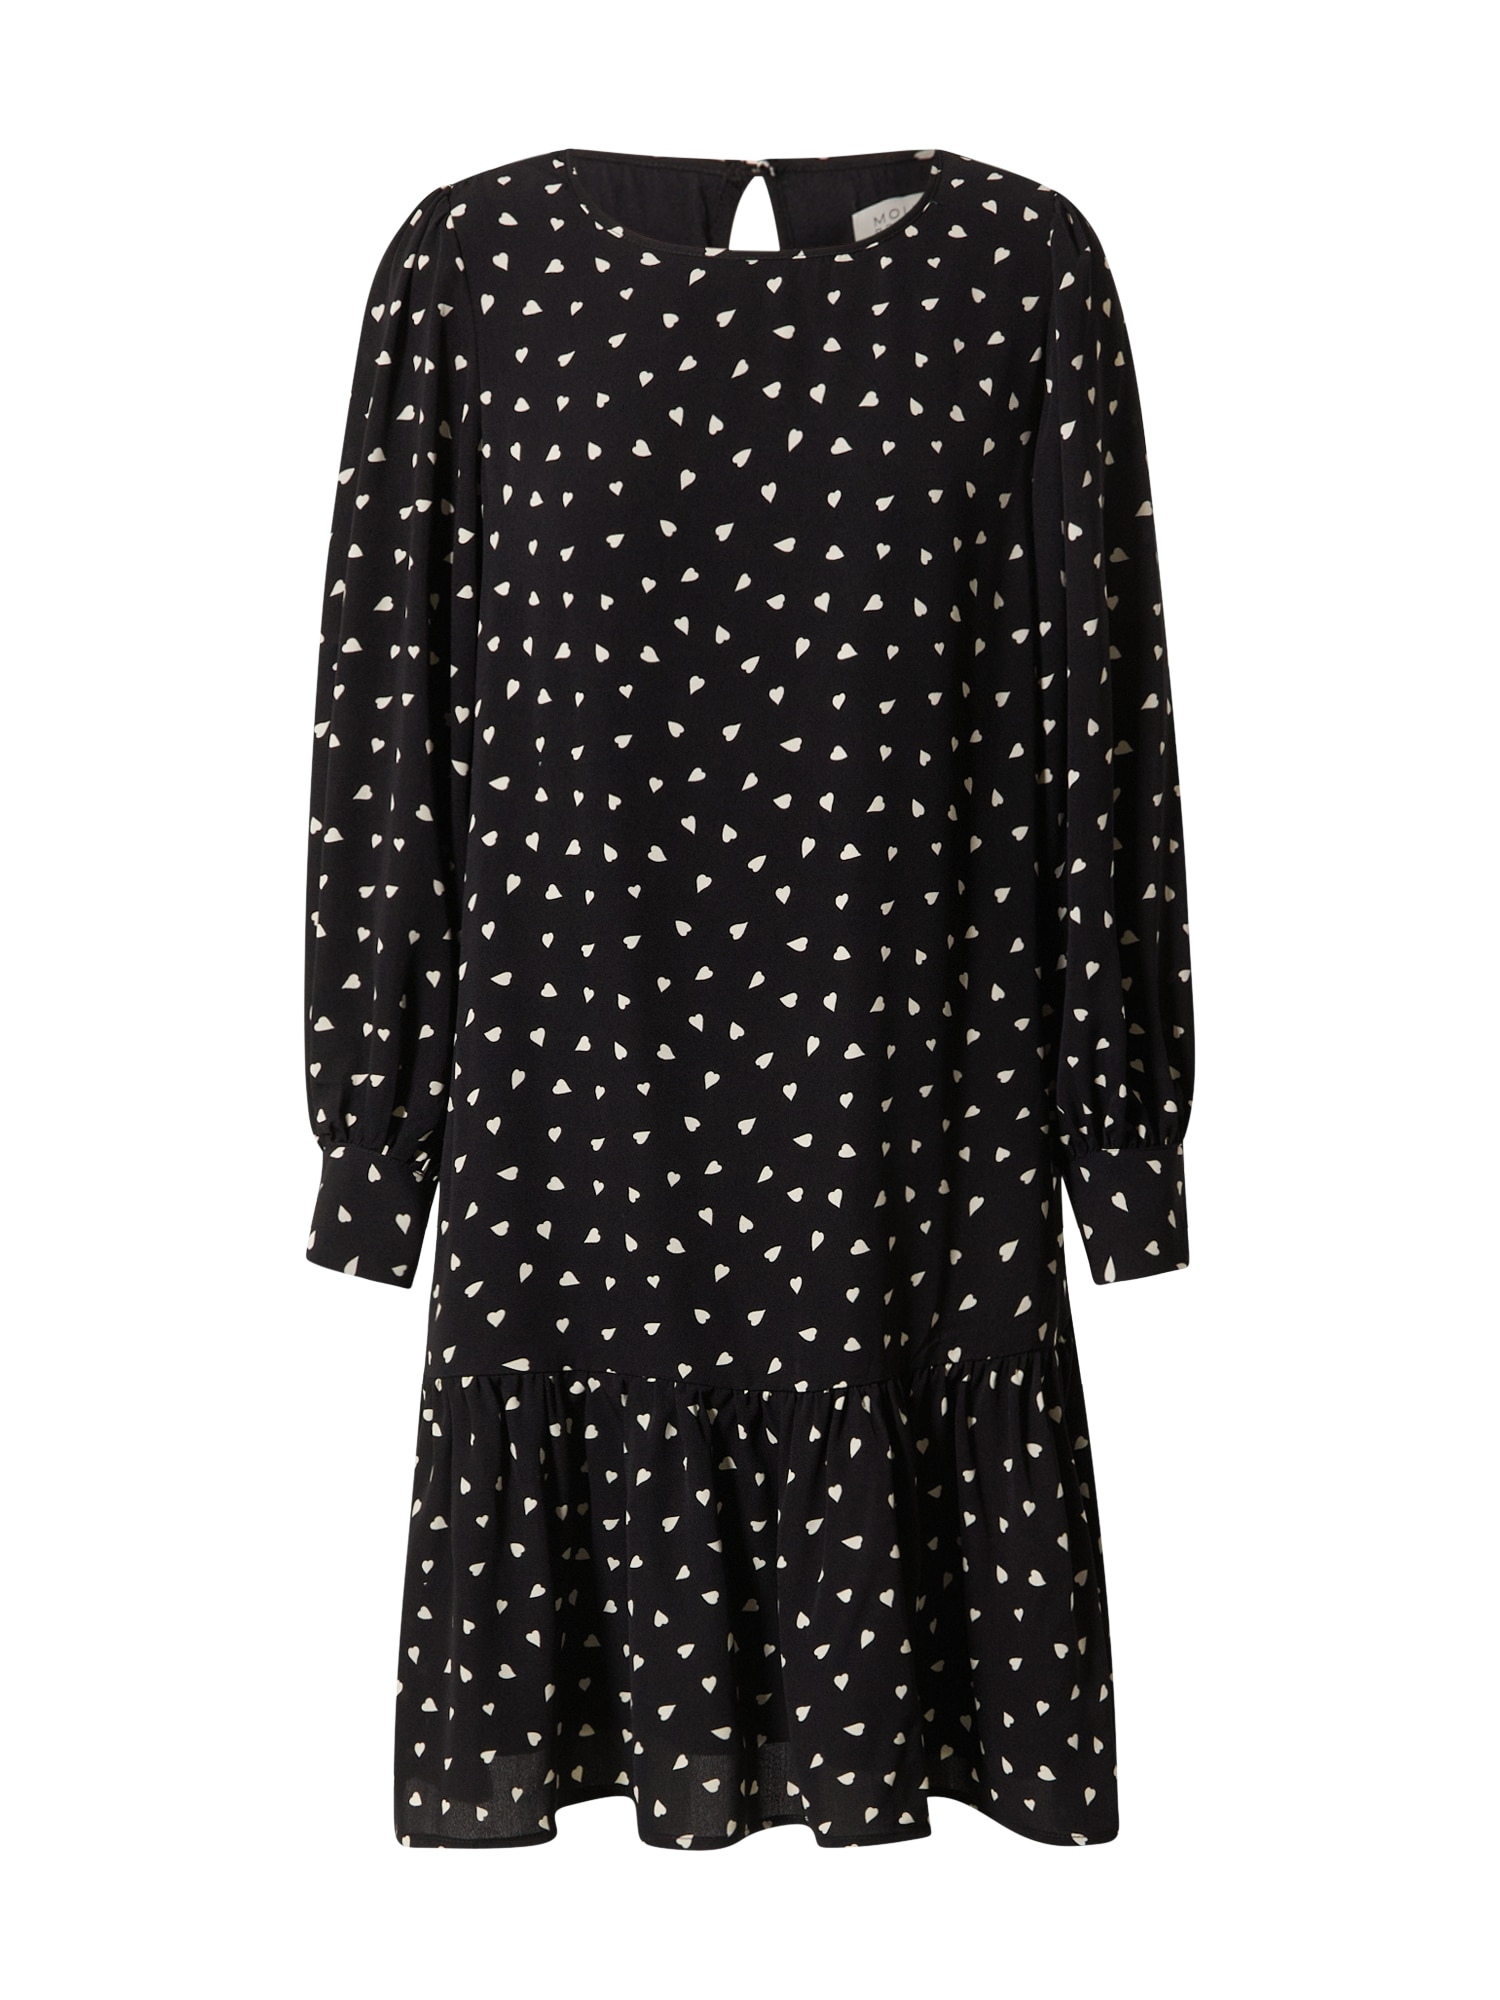 Molly BRACKEN Suknelė juoda / balta